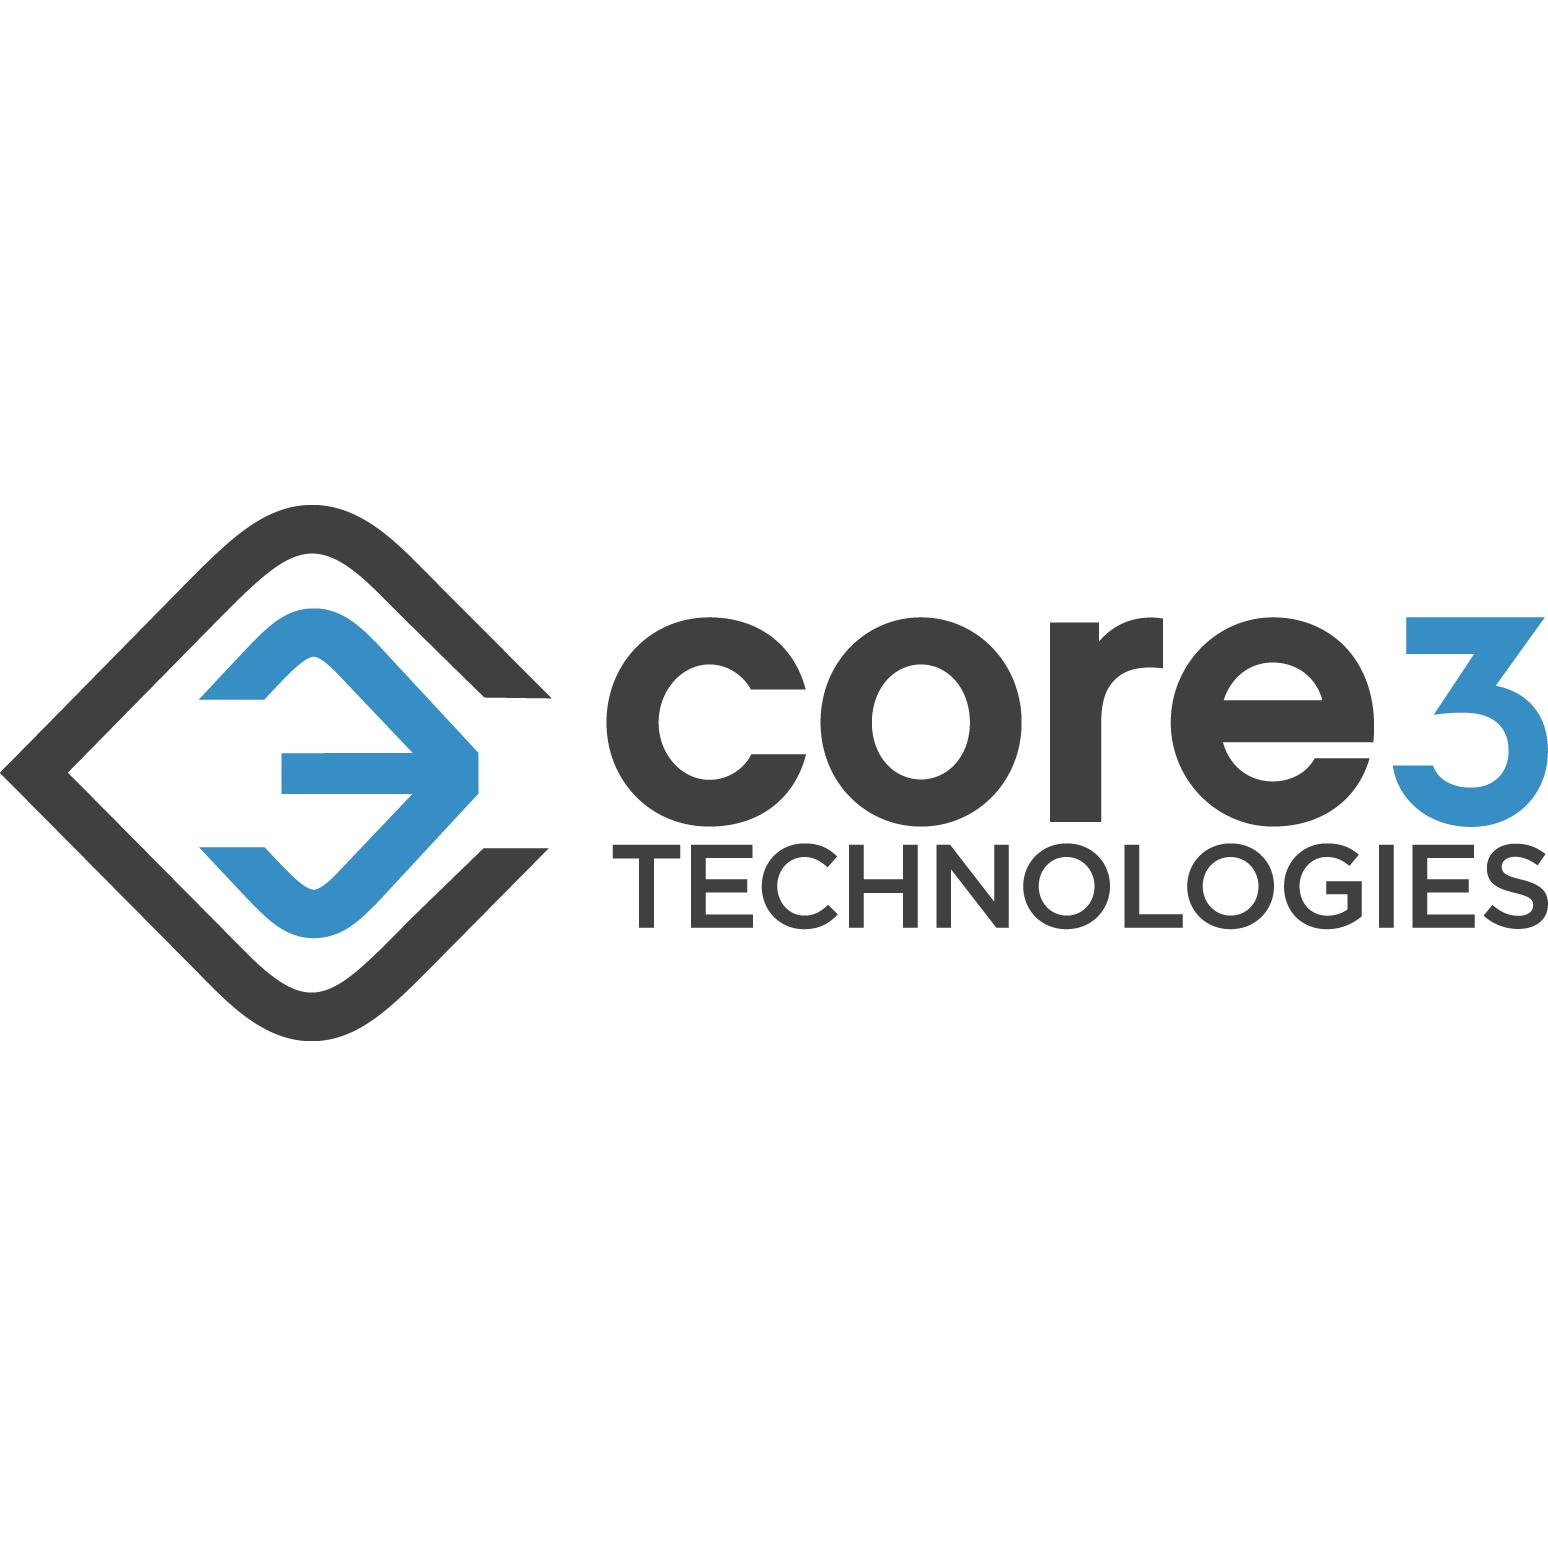 Core 3 Technologies